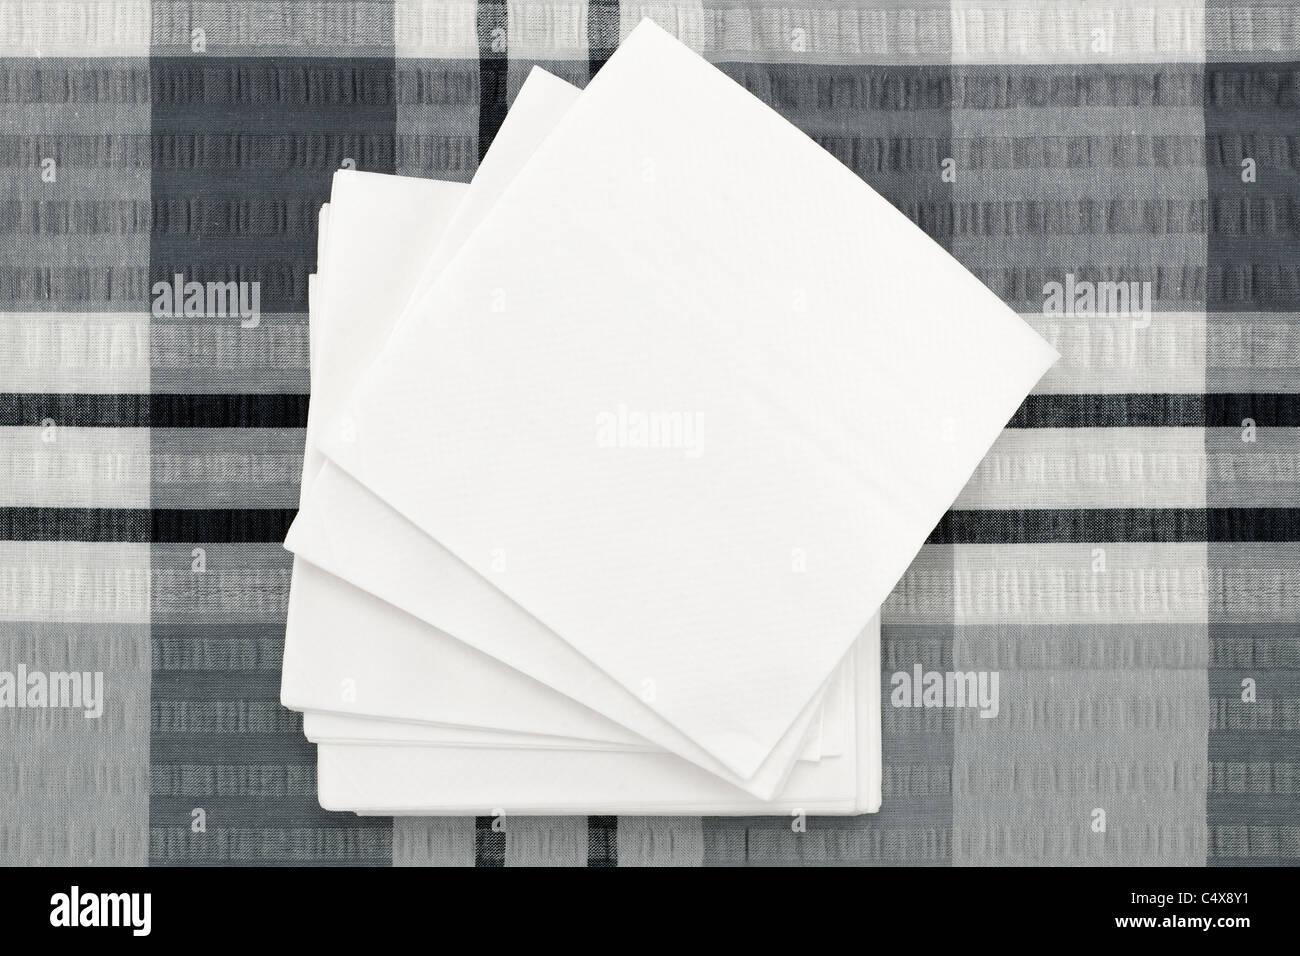 Pile of white napkins - Stock Image